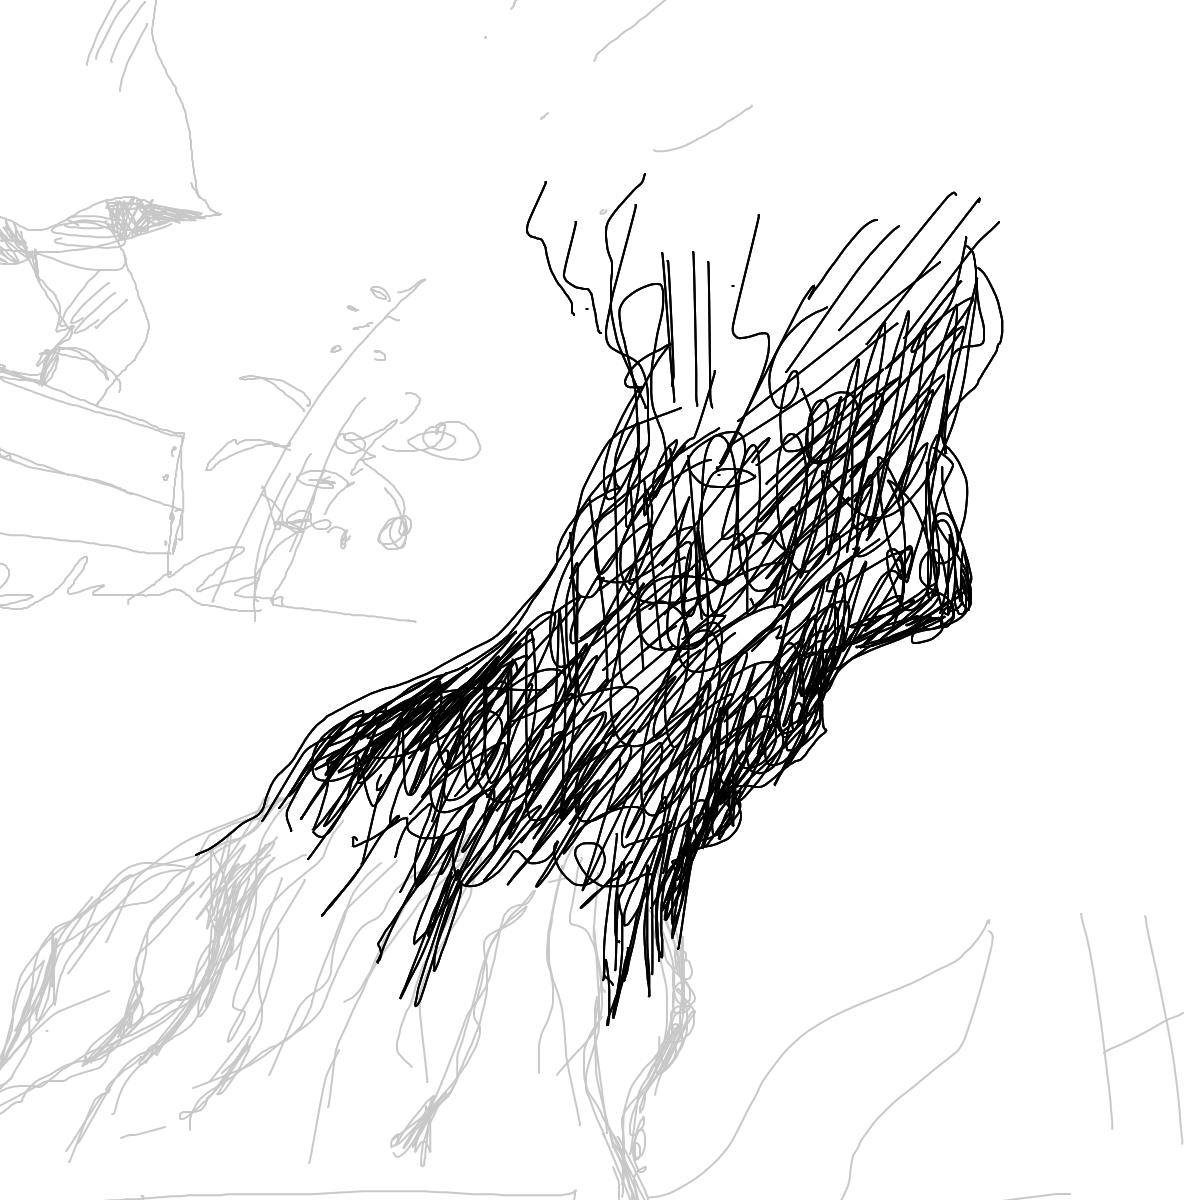 BAAAM drawing#6013 lat:51.5068130493164060lng: -0.1636381596326828